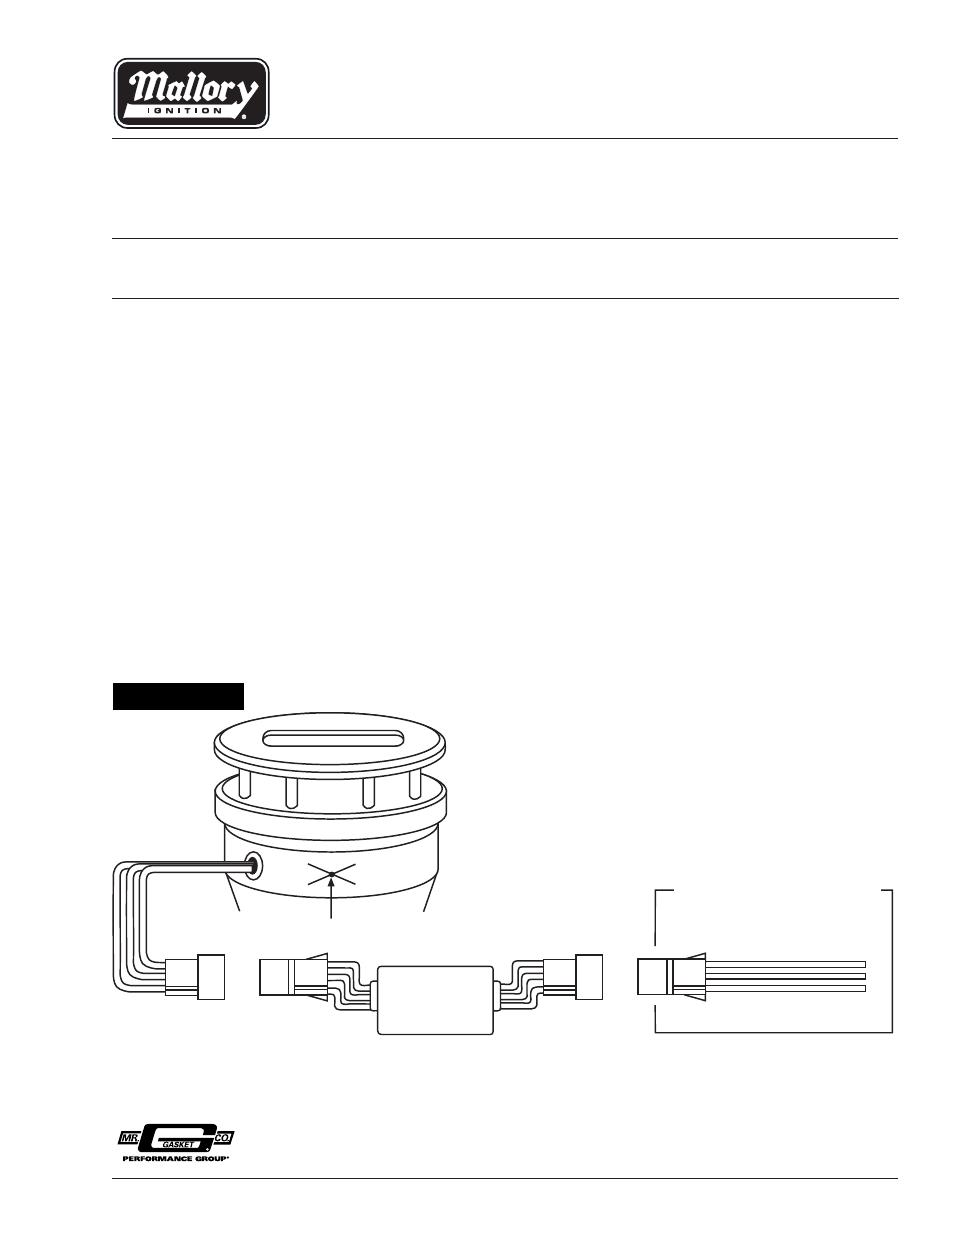 Perfect Mallory Unilite Distributor Wiring Diagram Gift - Wiring ...